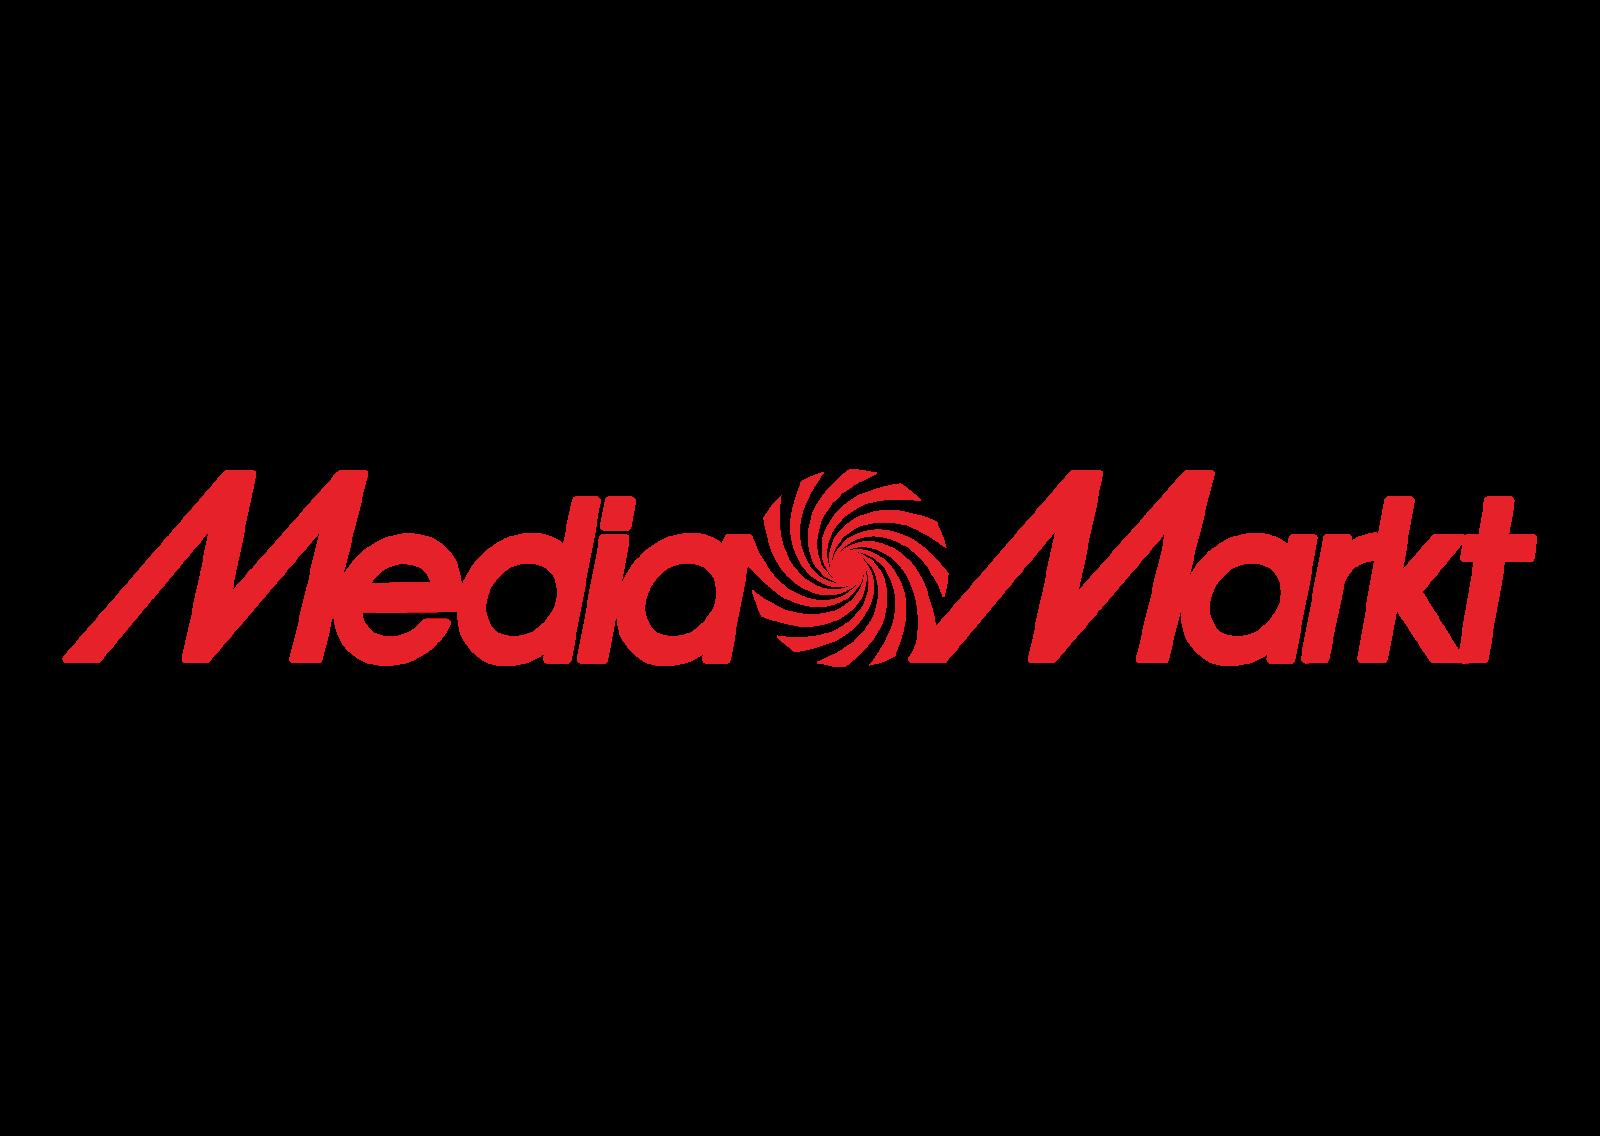 Media-Markt-Kobo Aura H2O oferta